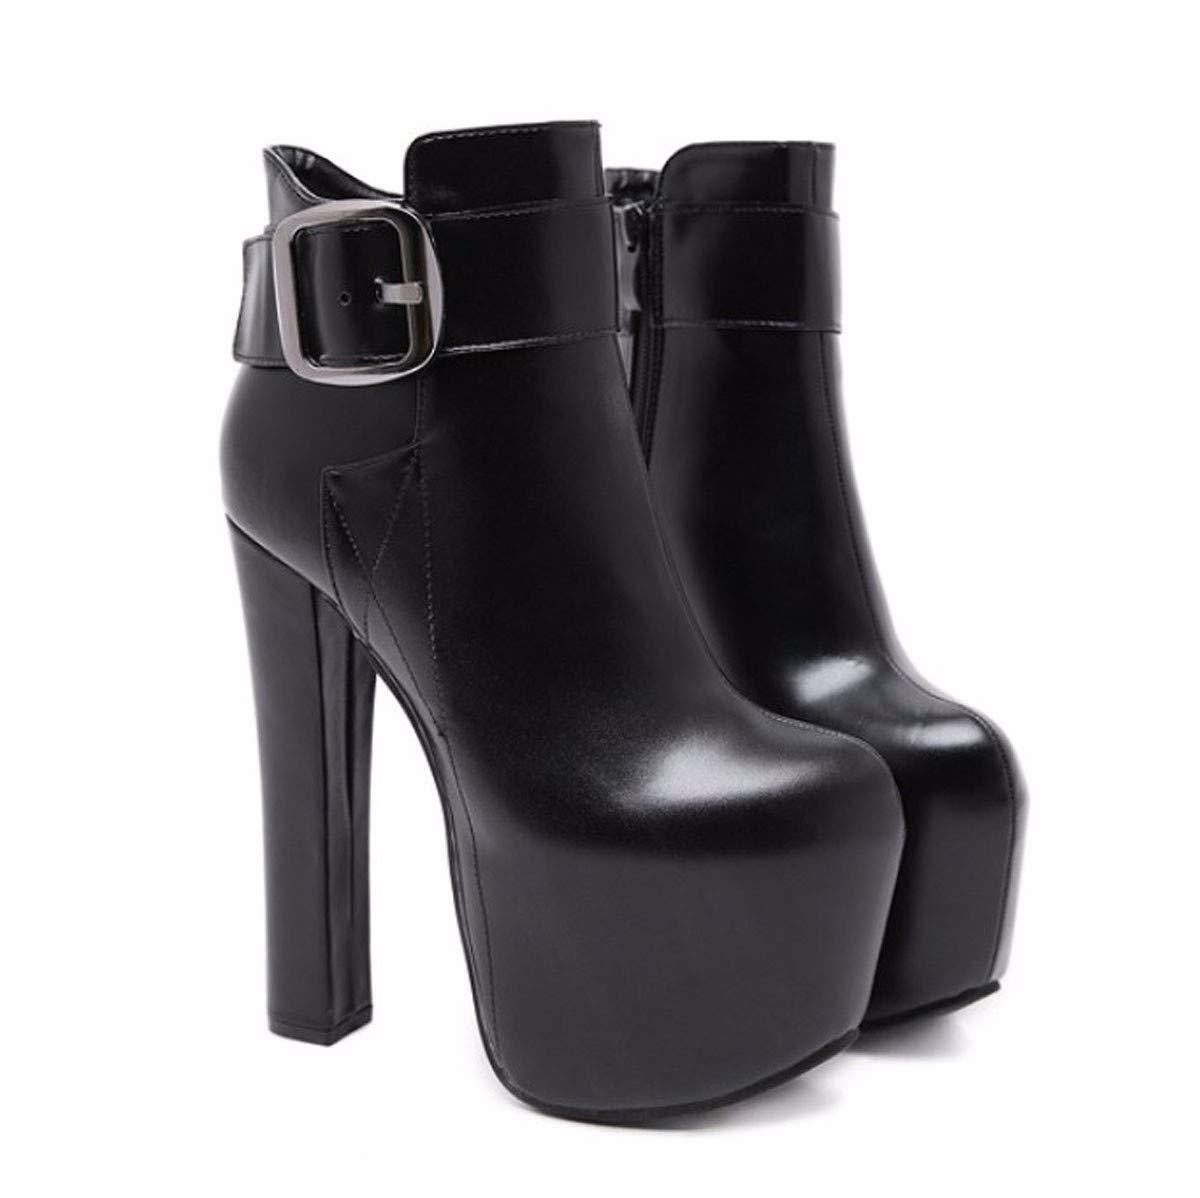 HBDLH Damenschuhe/Mode Kurze Stiefel High 17Cm Gürtel Harte Sohle Nachtclub Wasserdicht High - Heel HASS Hohe Stiefel.